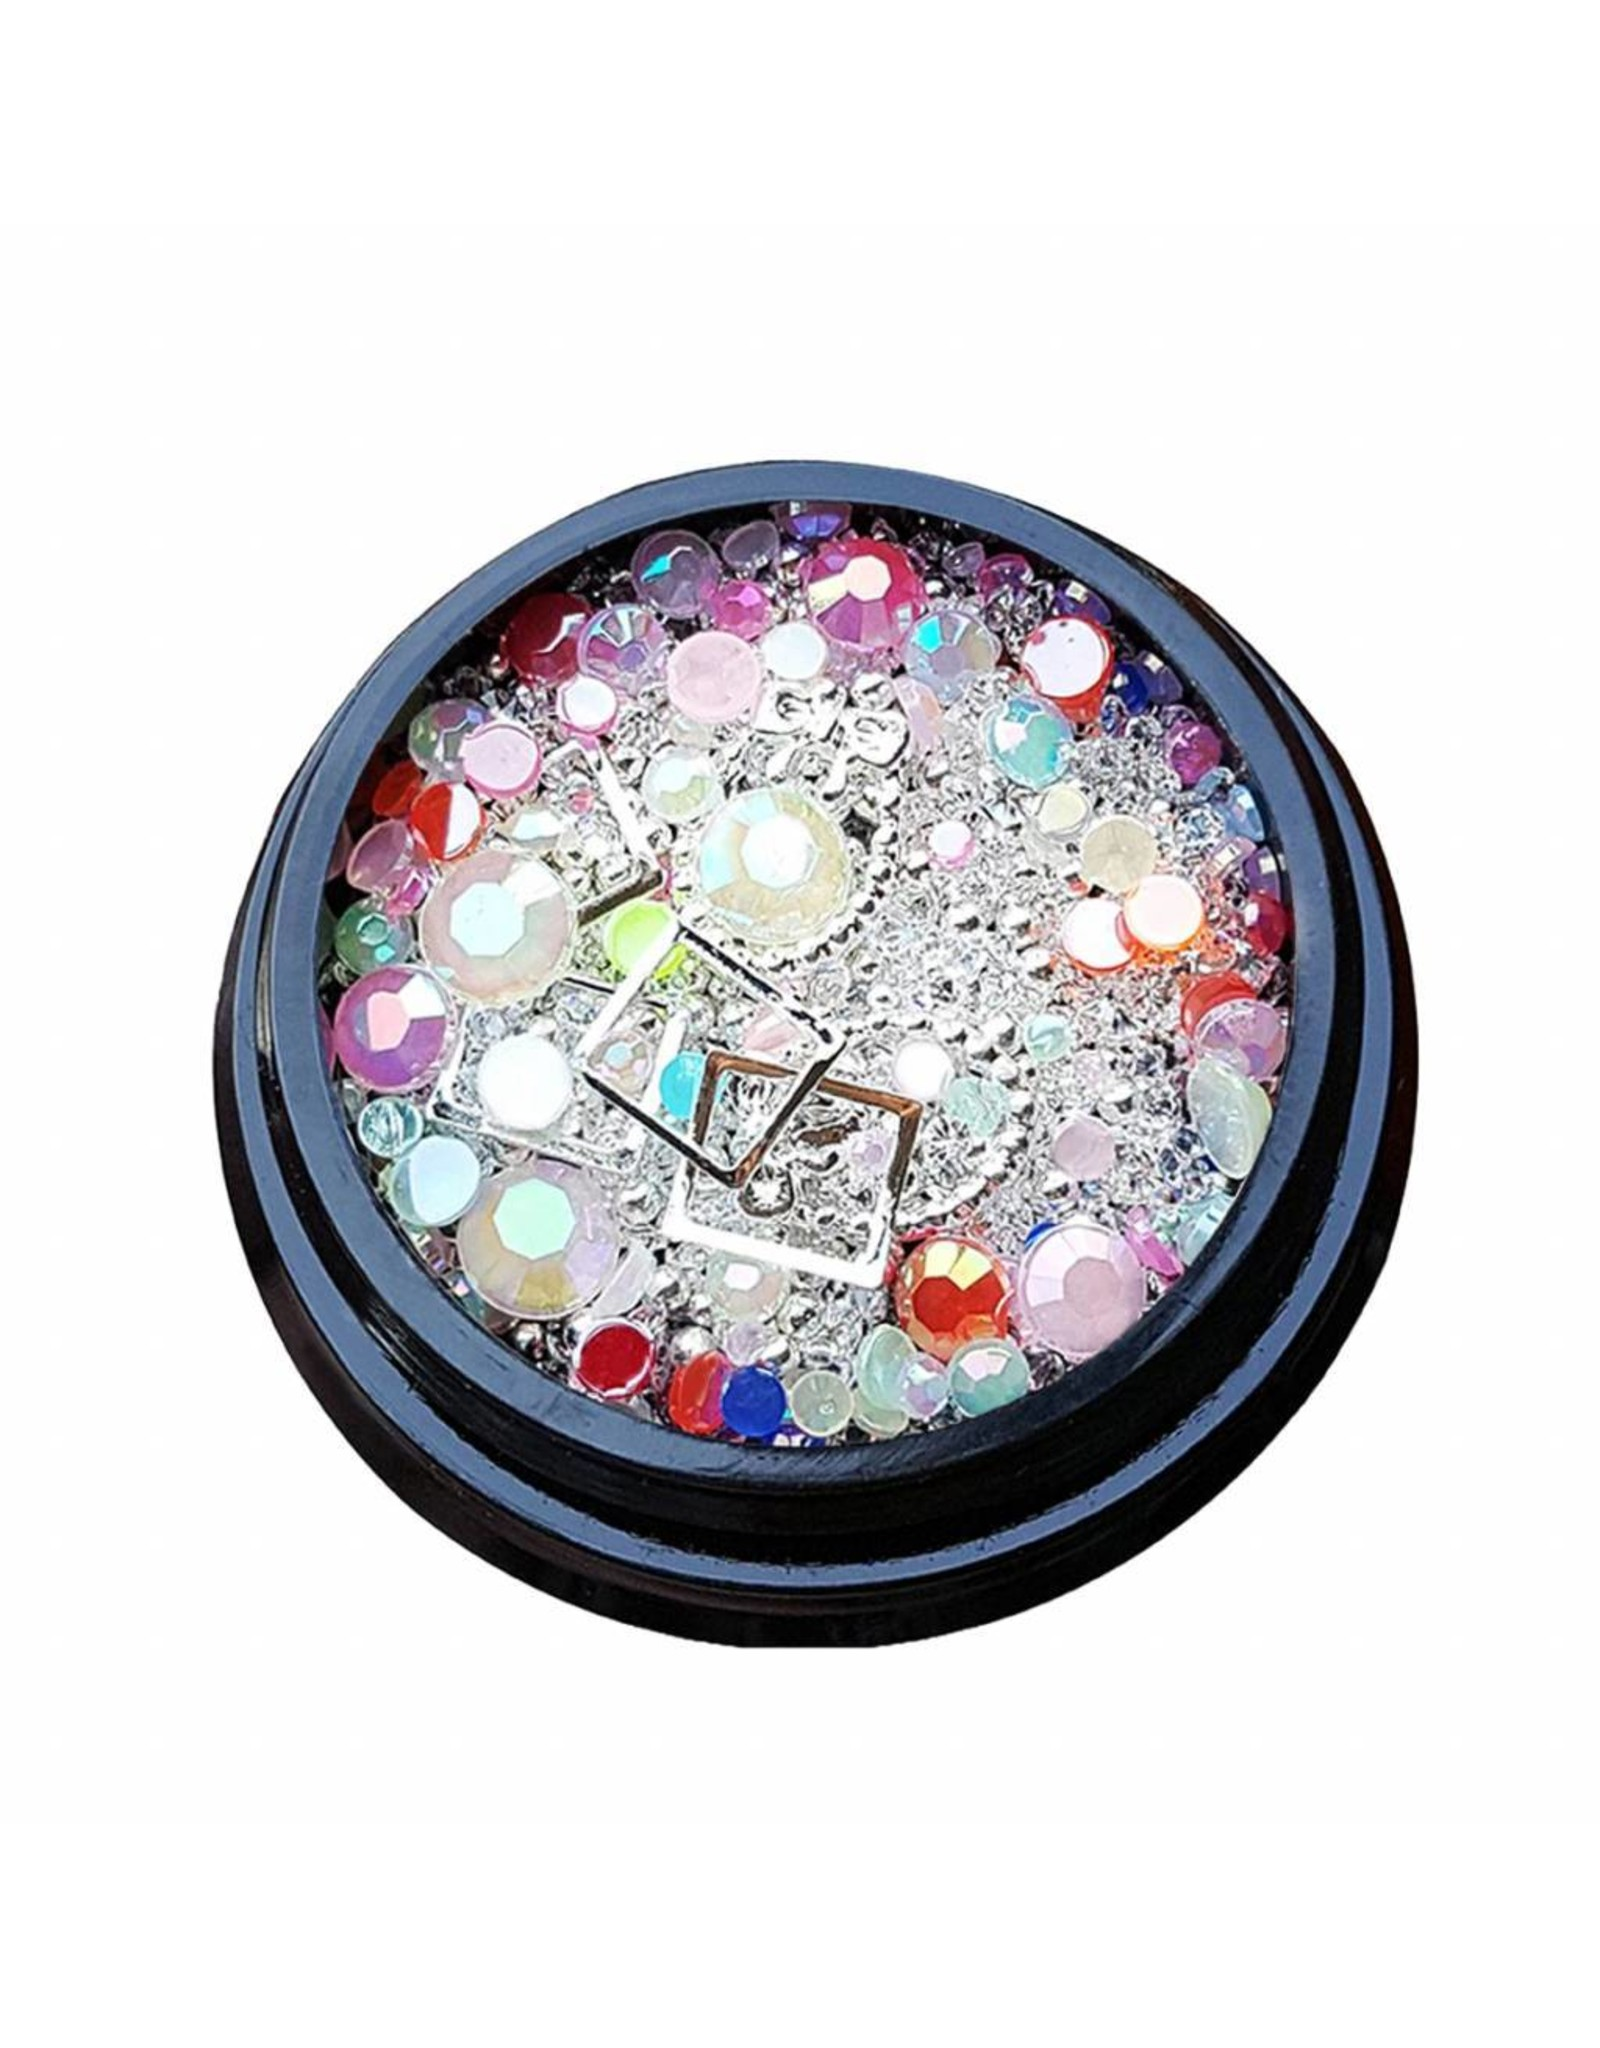 Merkloos 3D Mix of luxurious jewelry  (06)